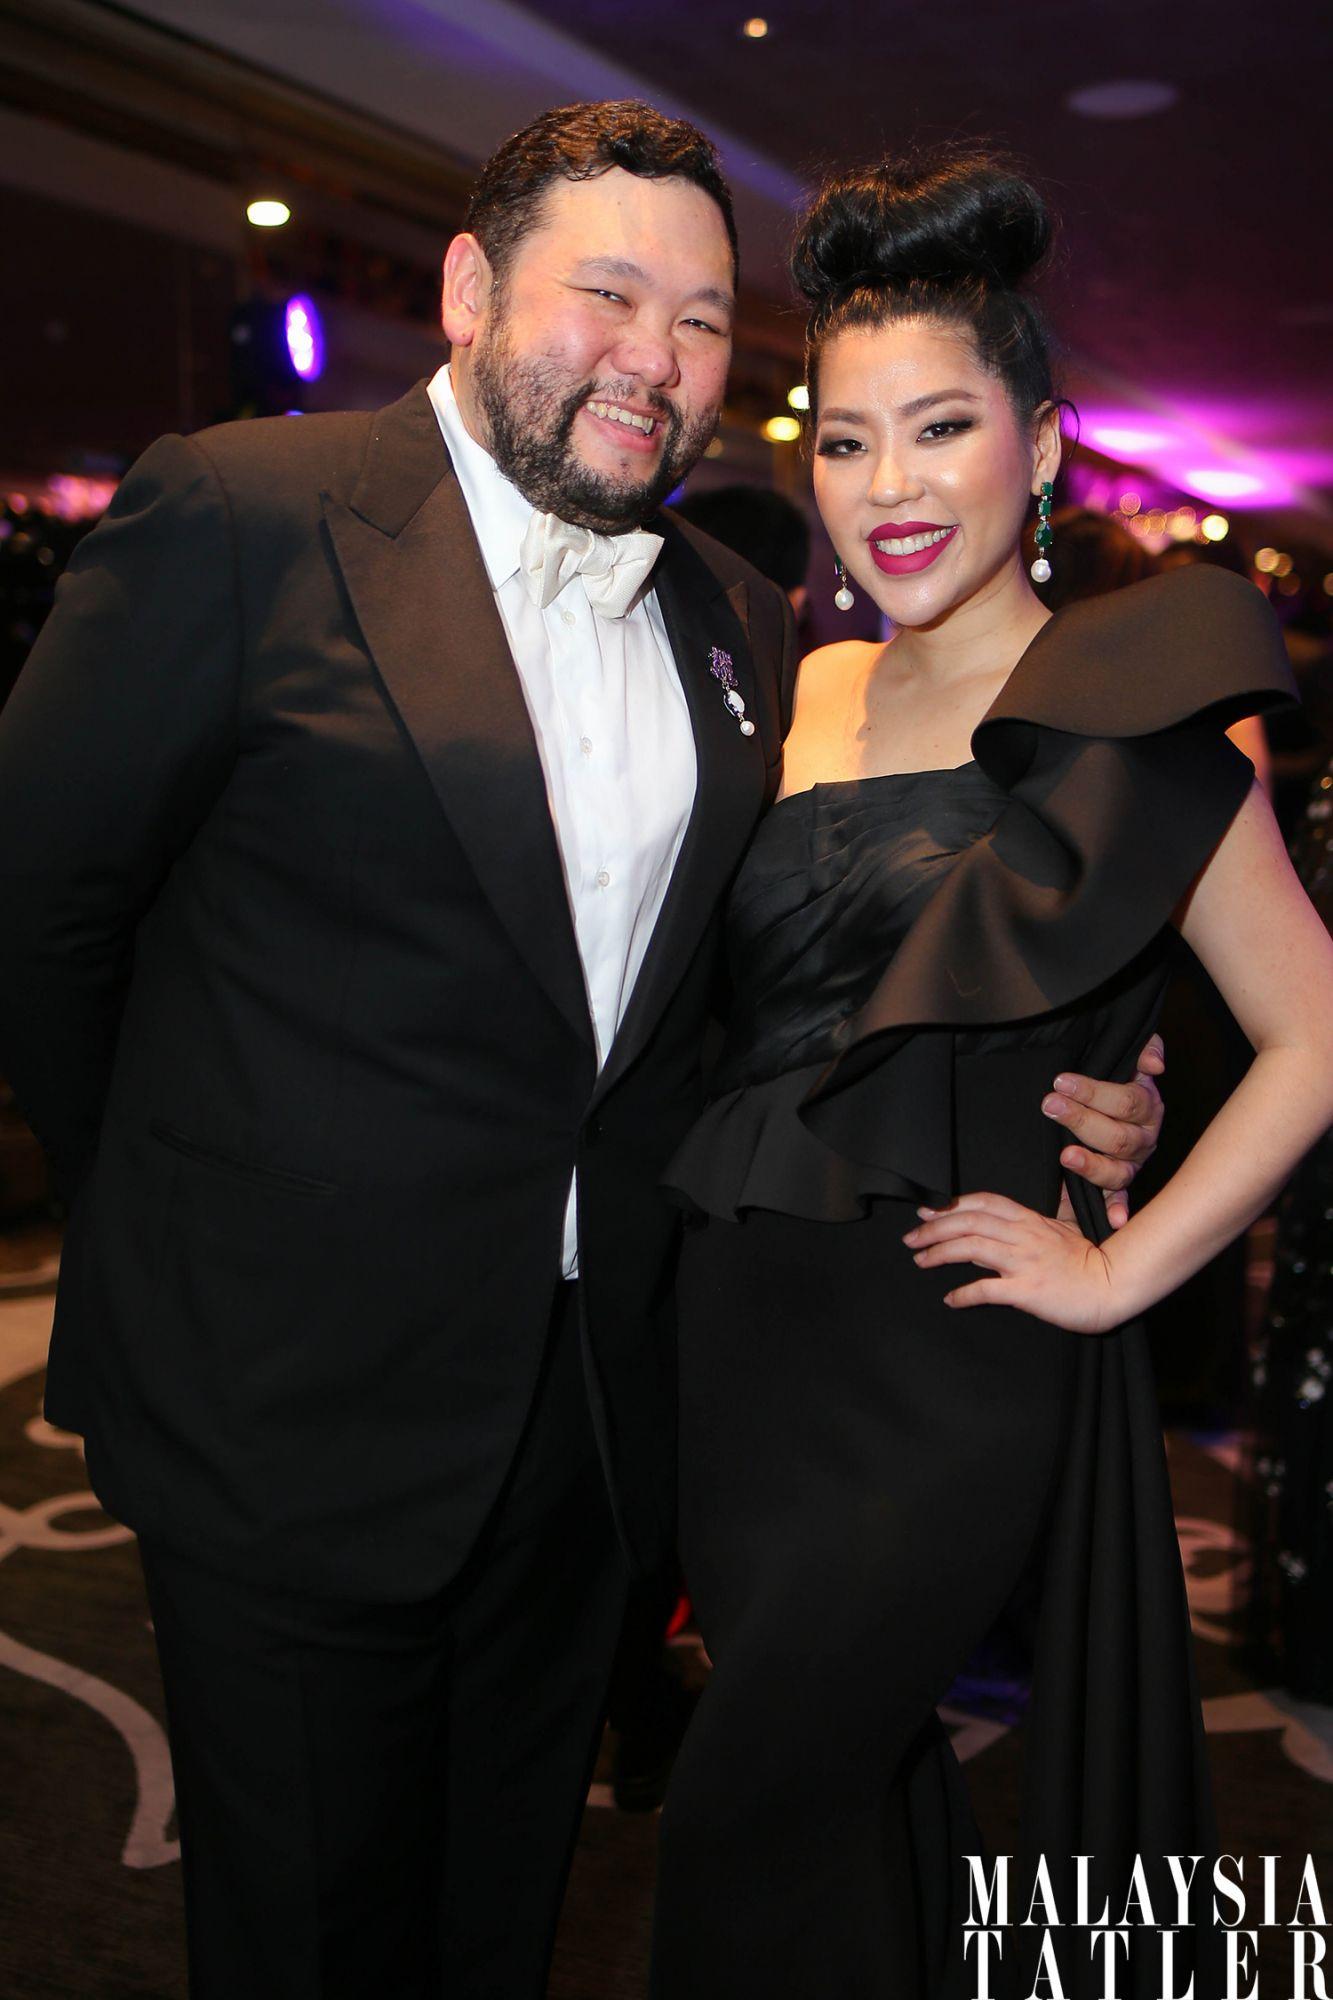 Benjamin Yong and Elizabeth Lee